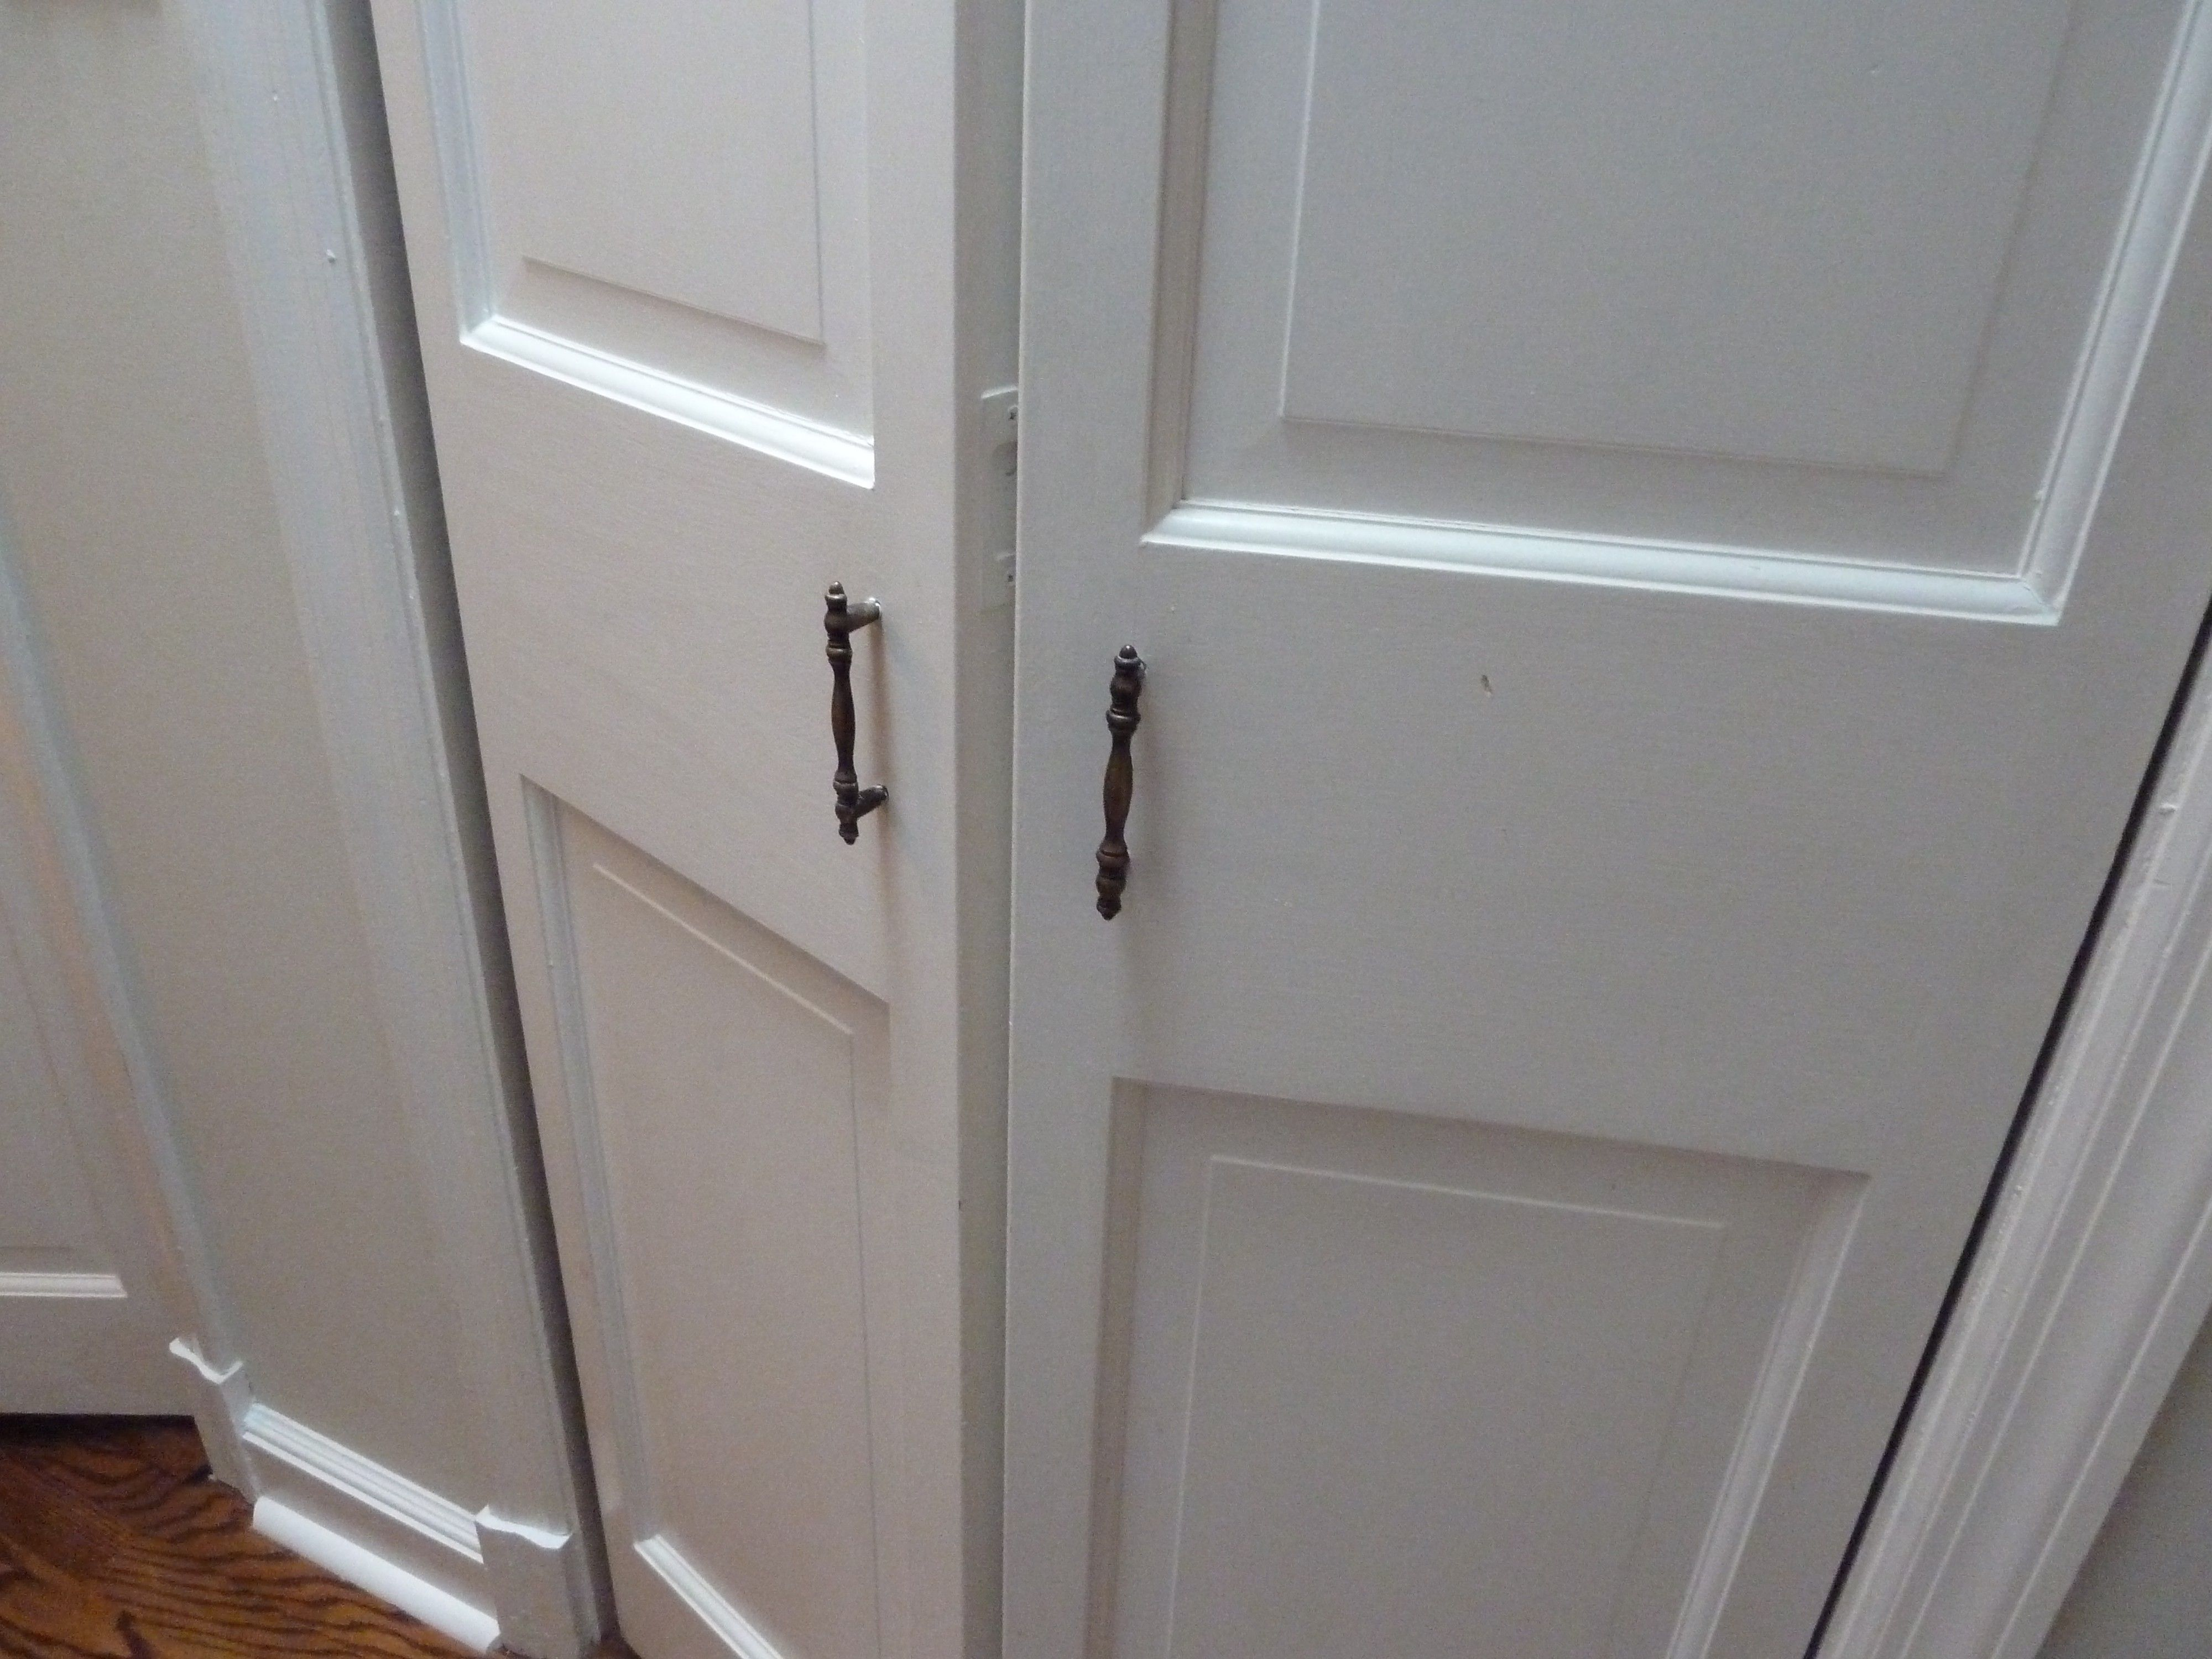 Pin On Door Handles And Locks